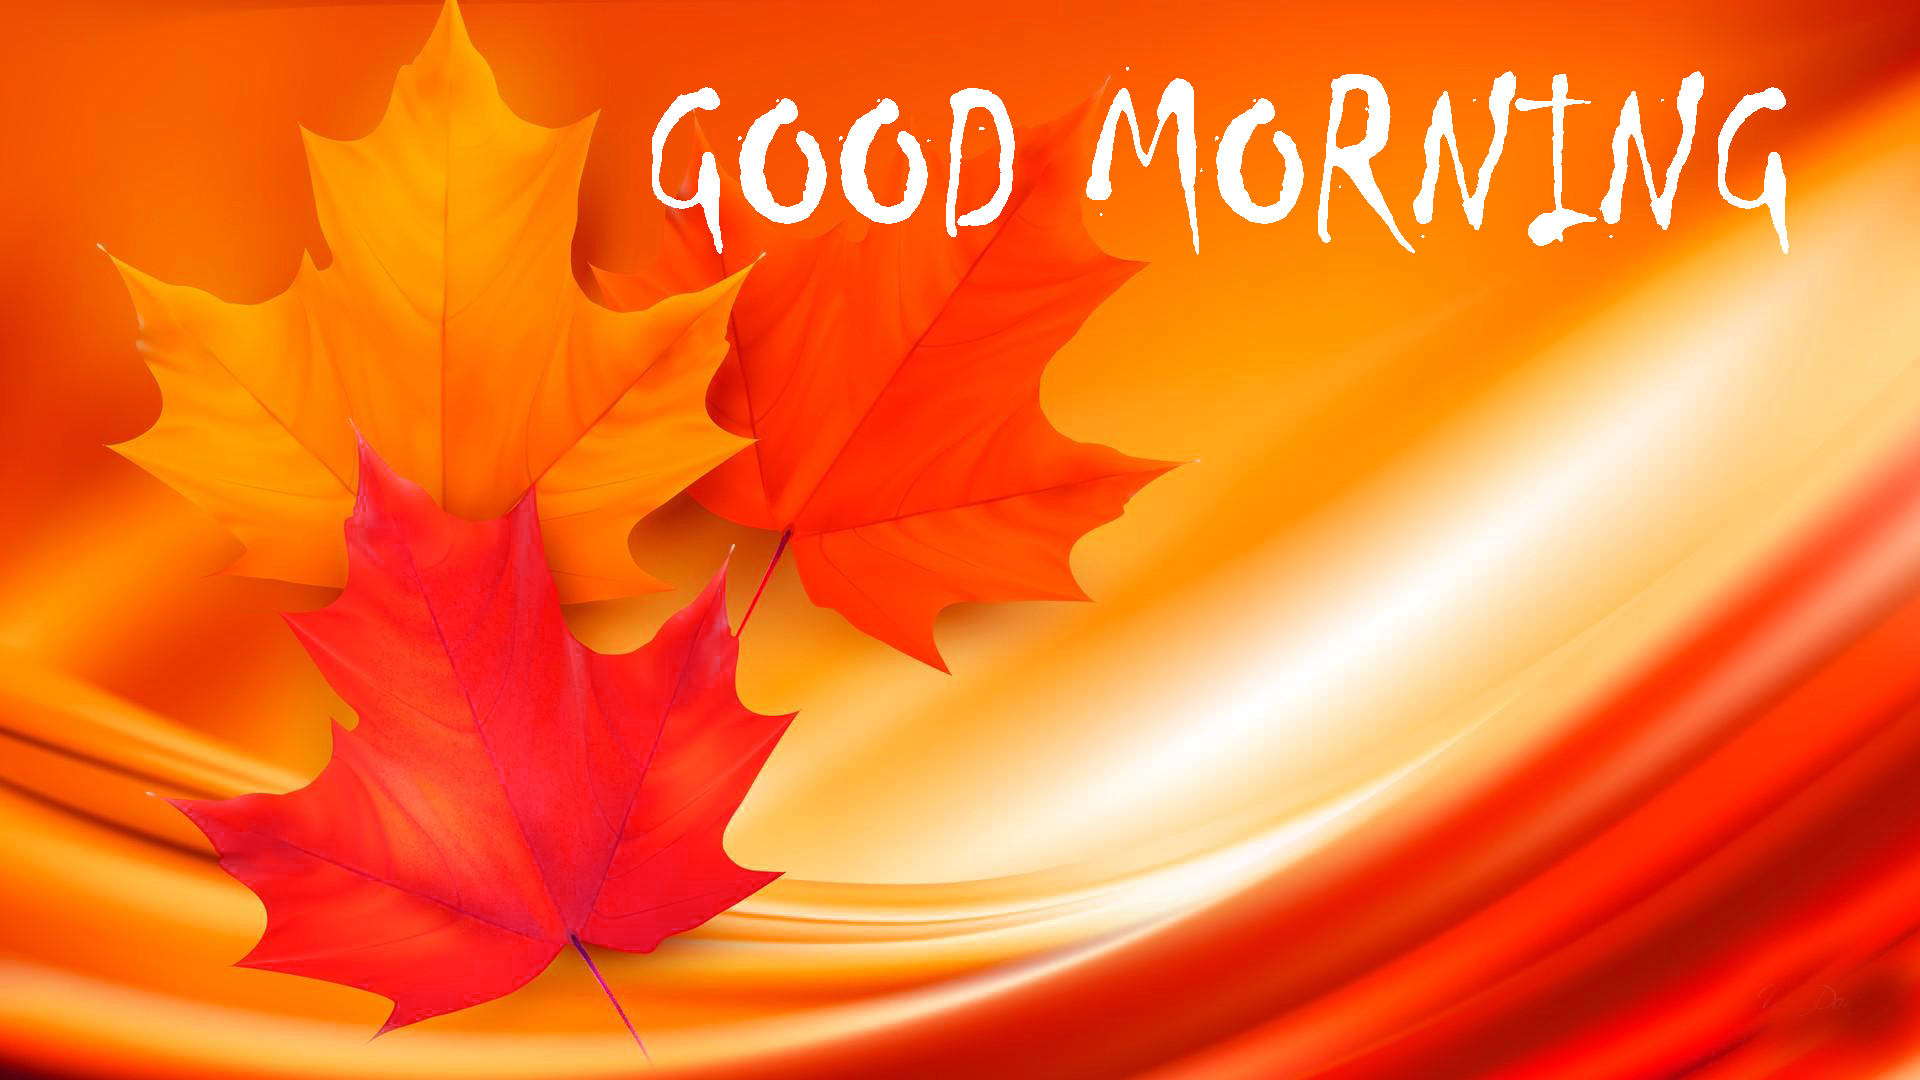 169 Good Morning Status Images Hd Download Good Morning Images Good Morning Photo Hd Downlaod Good Morning Pics Wallpaper Hd